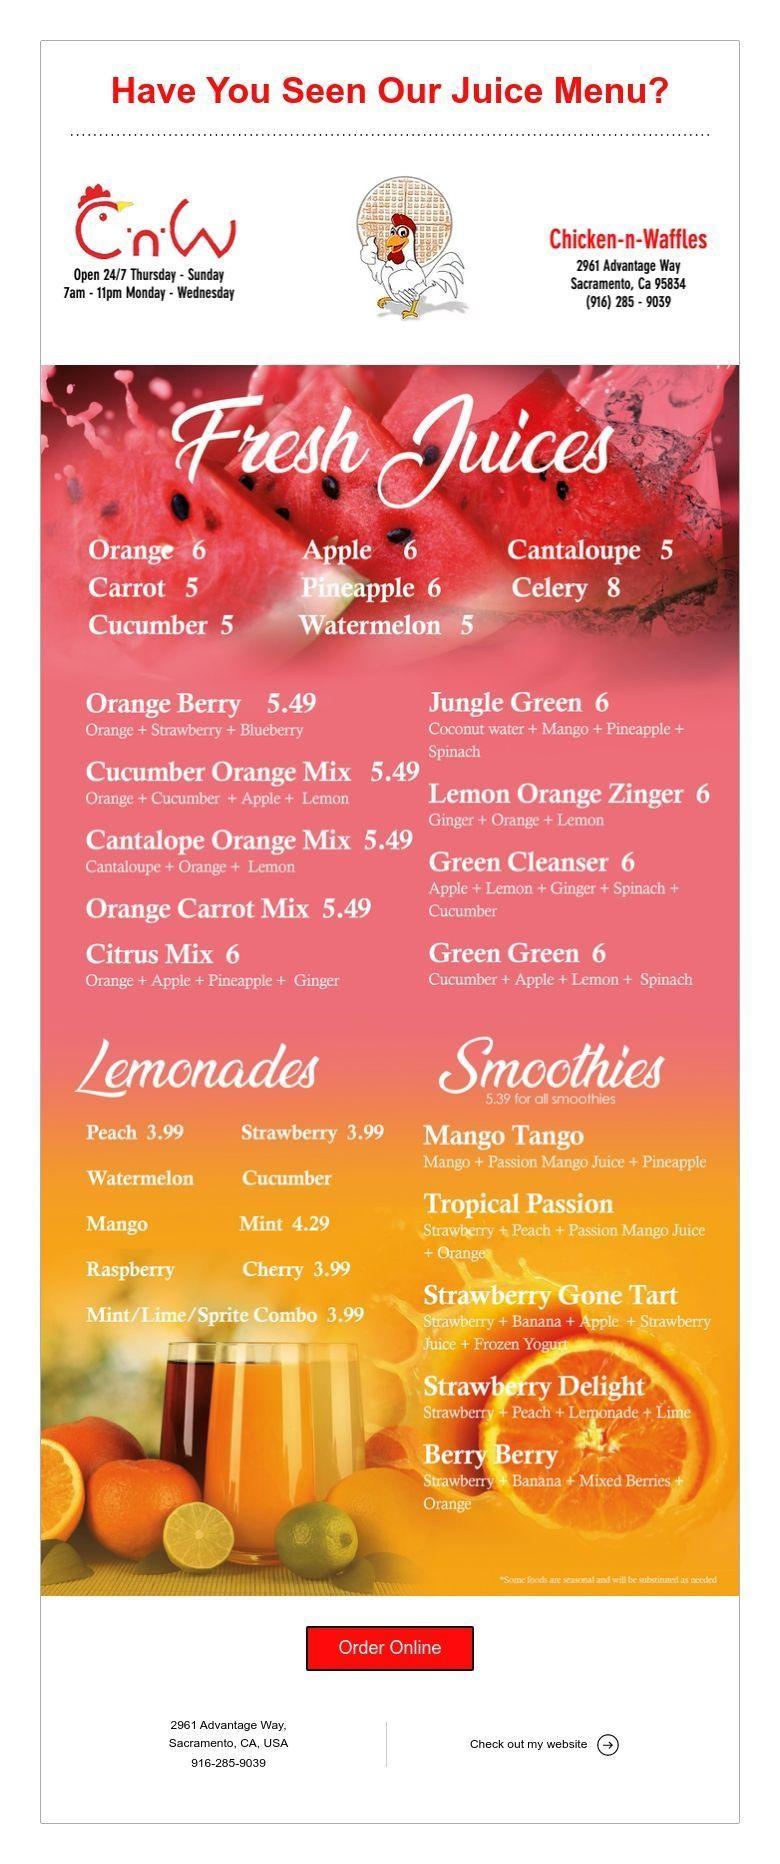 Have you seen our juice menu juice menu menu fresh juice